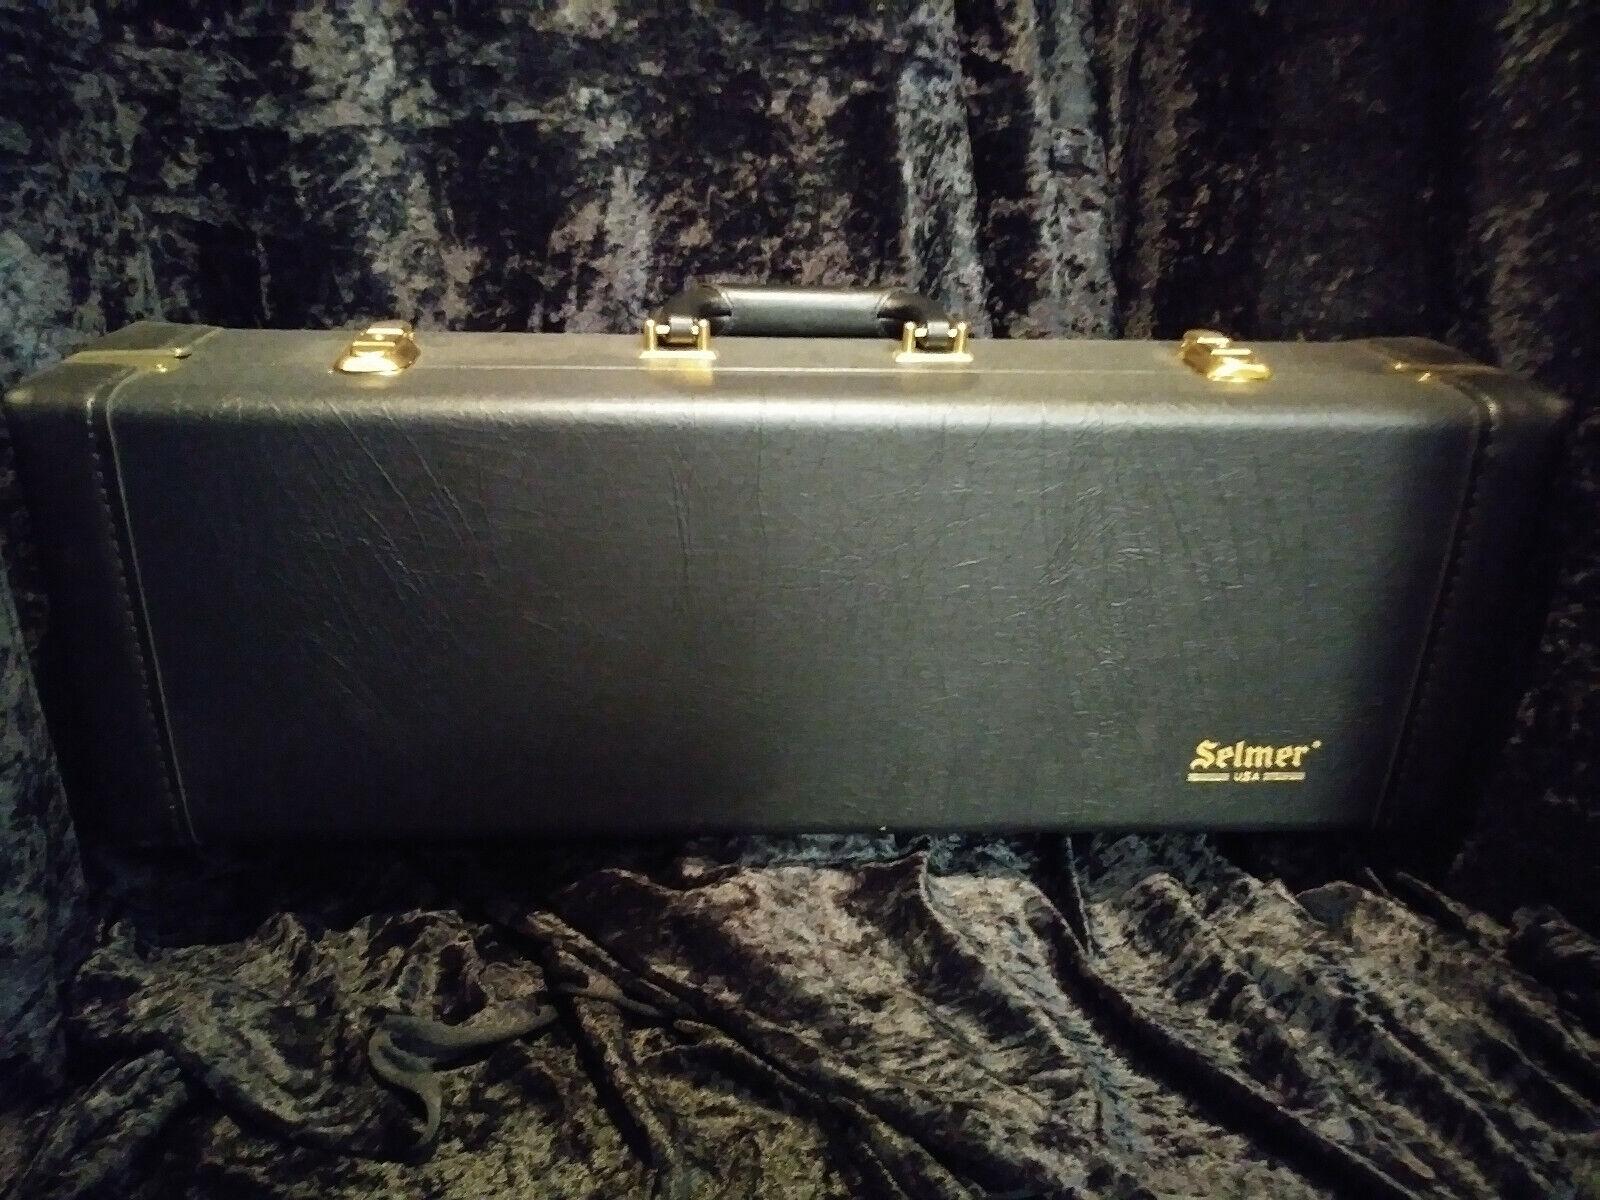 Selmer Deluxe Straight Soprano Saxophone Case schwarz With Gold Hardware